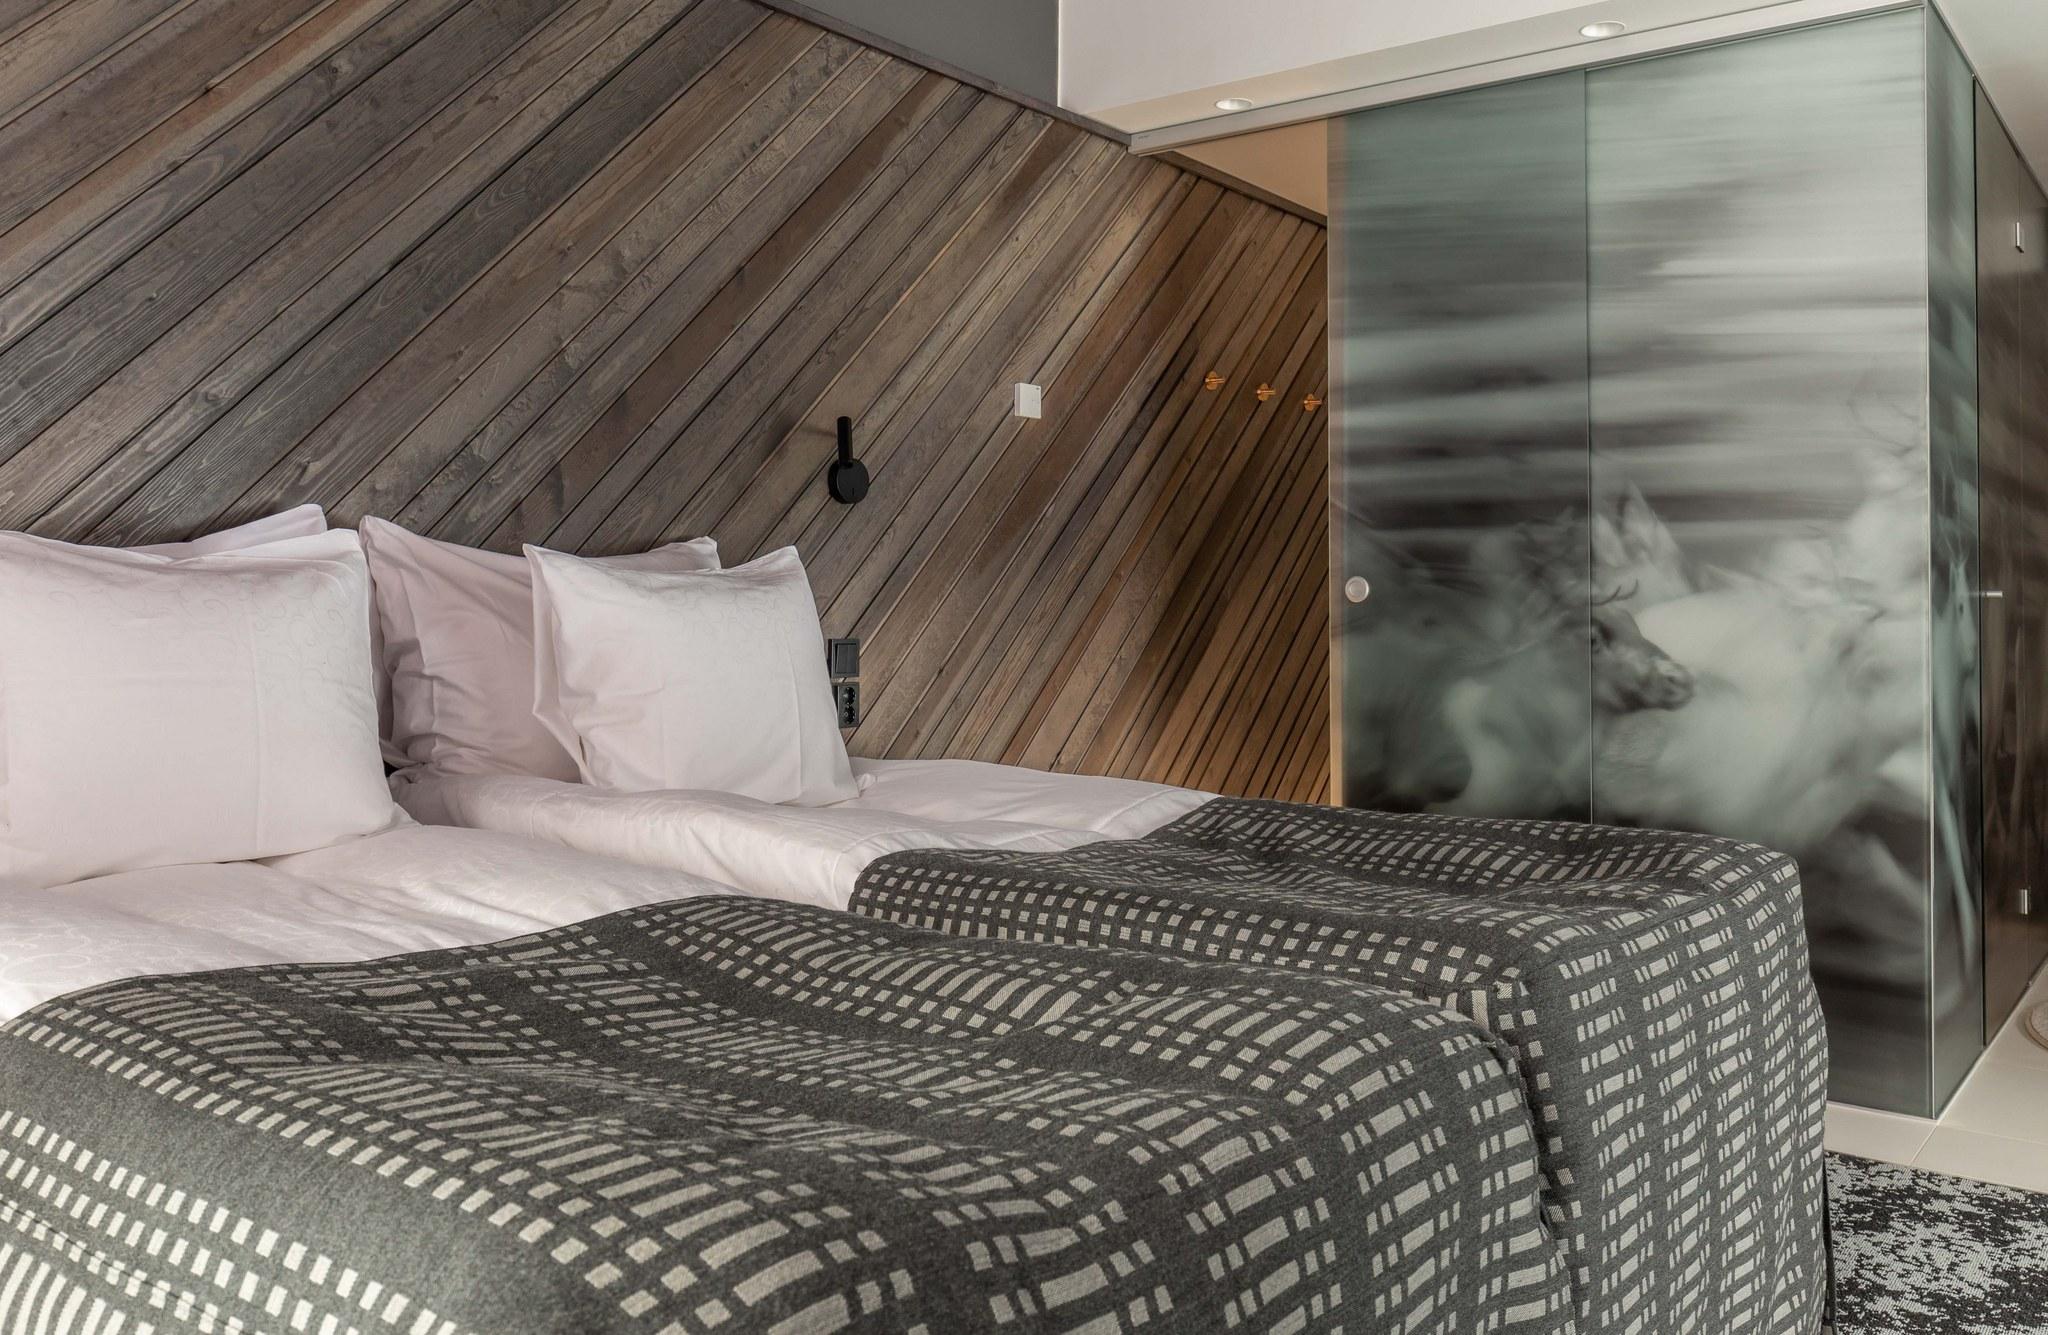 Design Hotel Levi 3 - Arno De La Chapelle